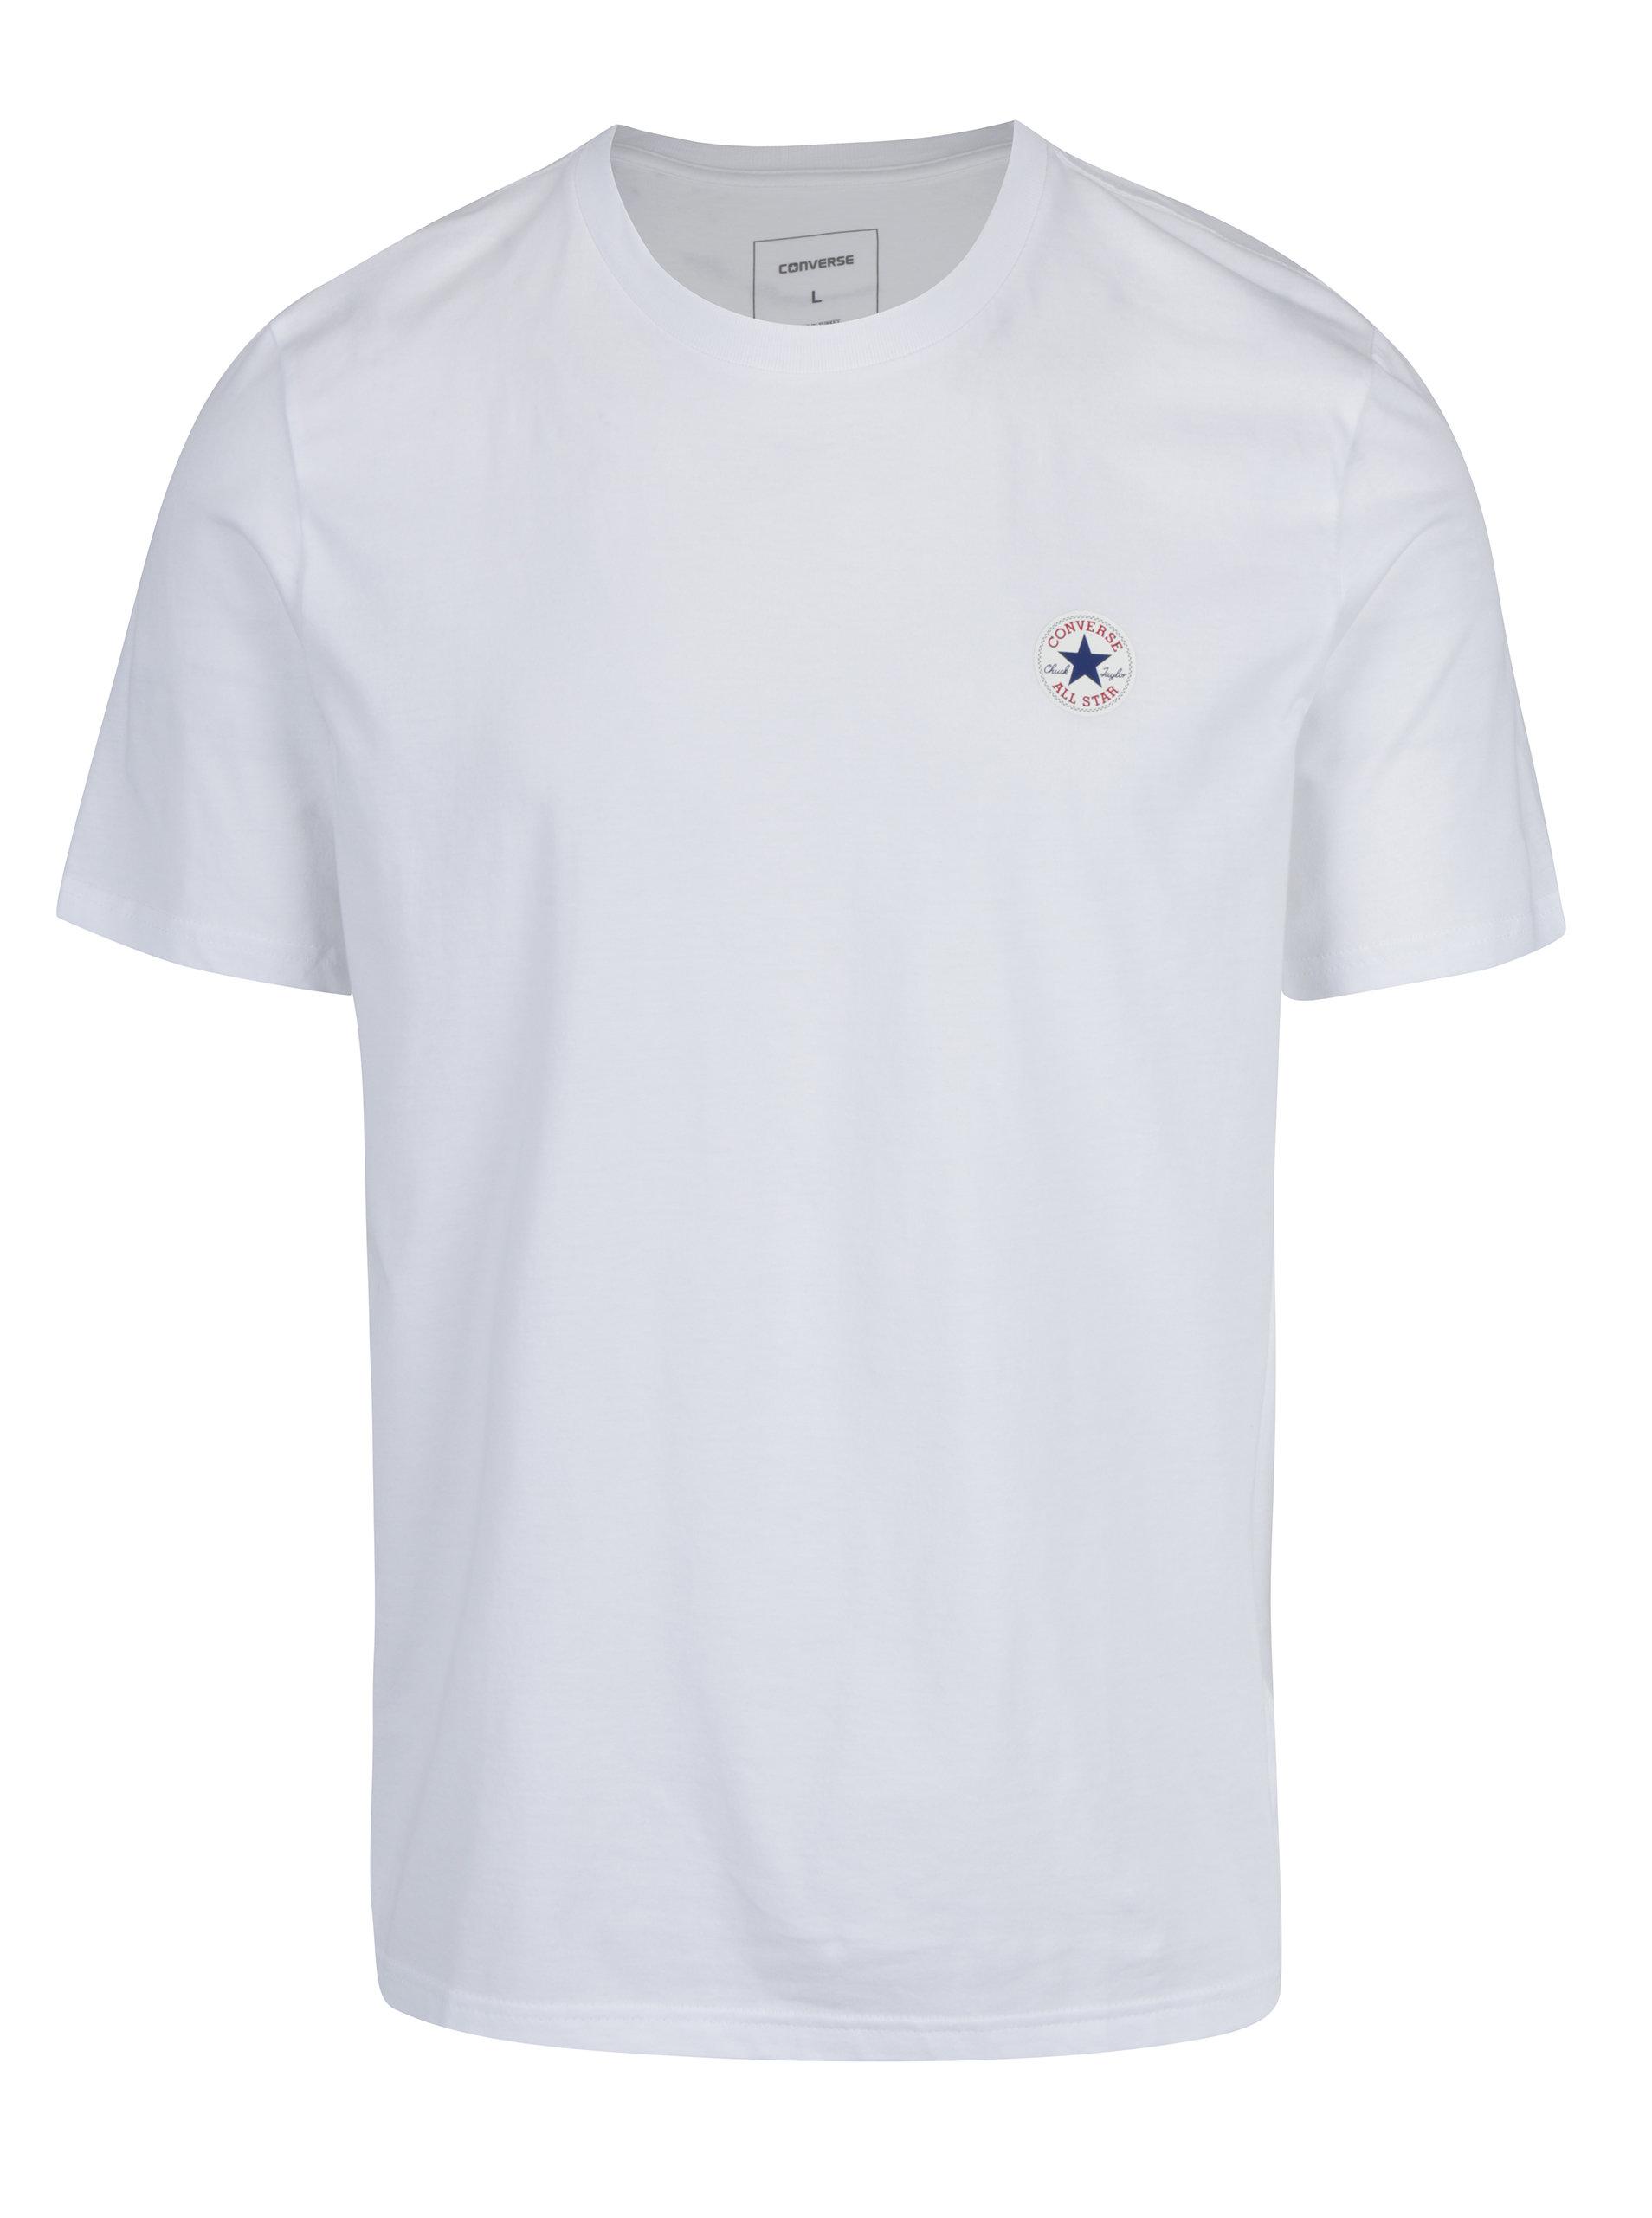 Bílé pánské tričko Converse Core Left Chest ... 7067a6ecec